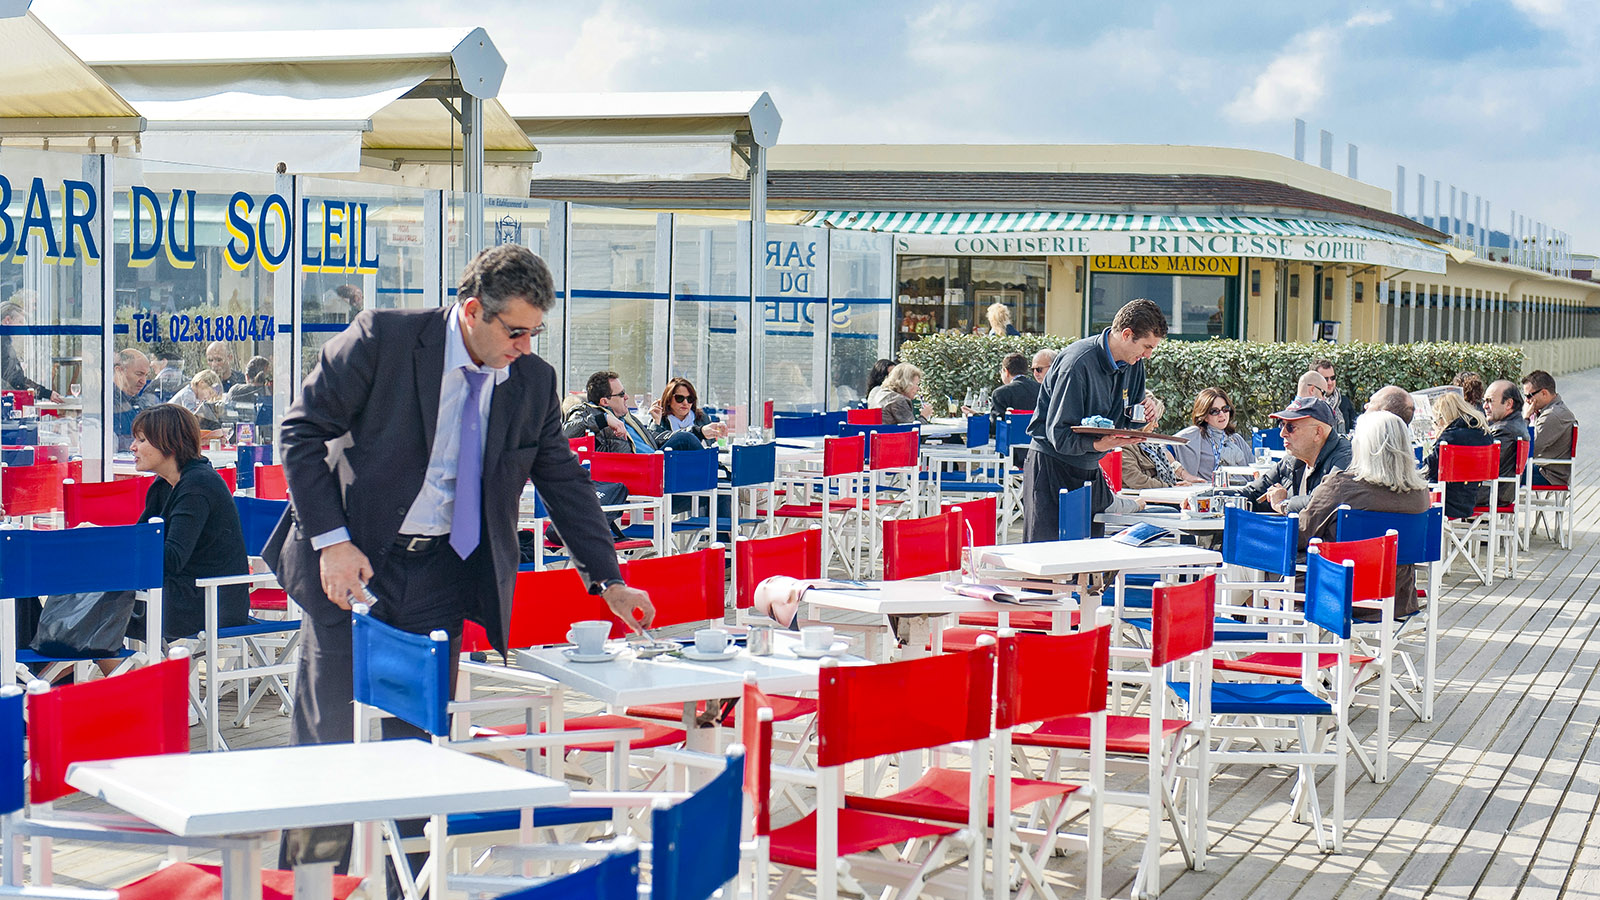 Côte Fleurie: Bar du Soleil in Deauville. Foto: Hilke Maunder